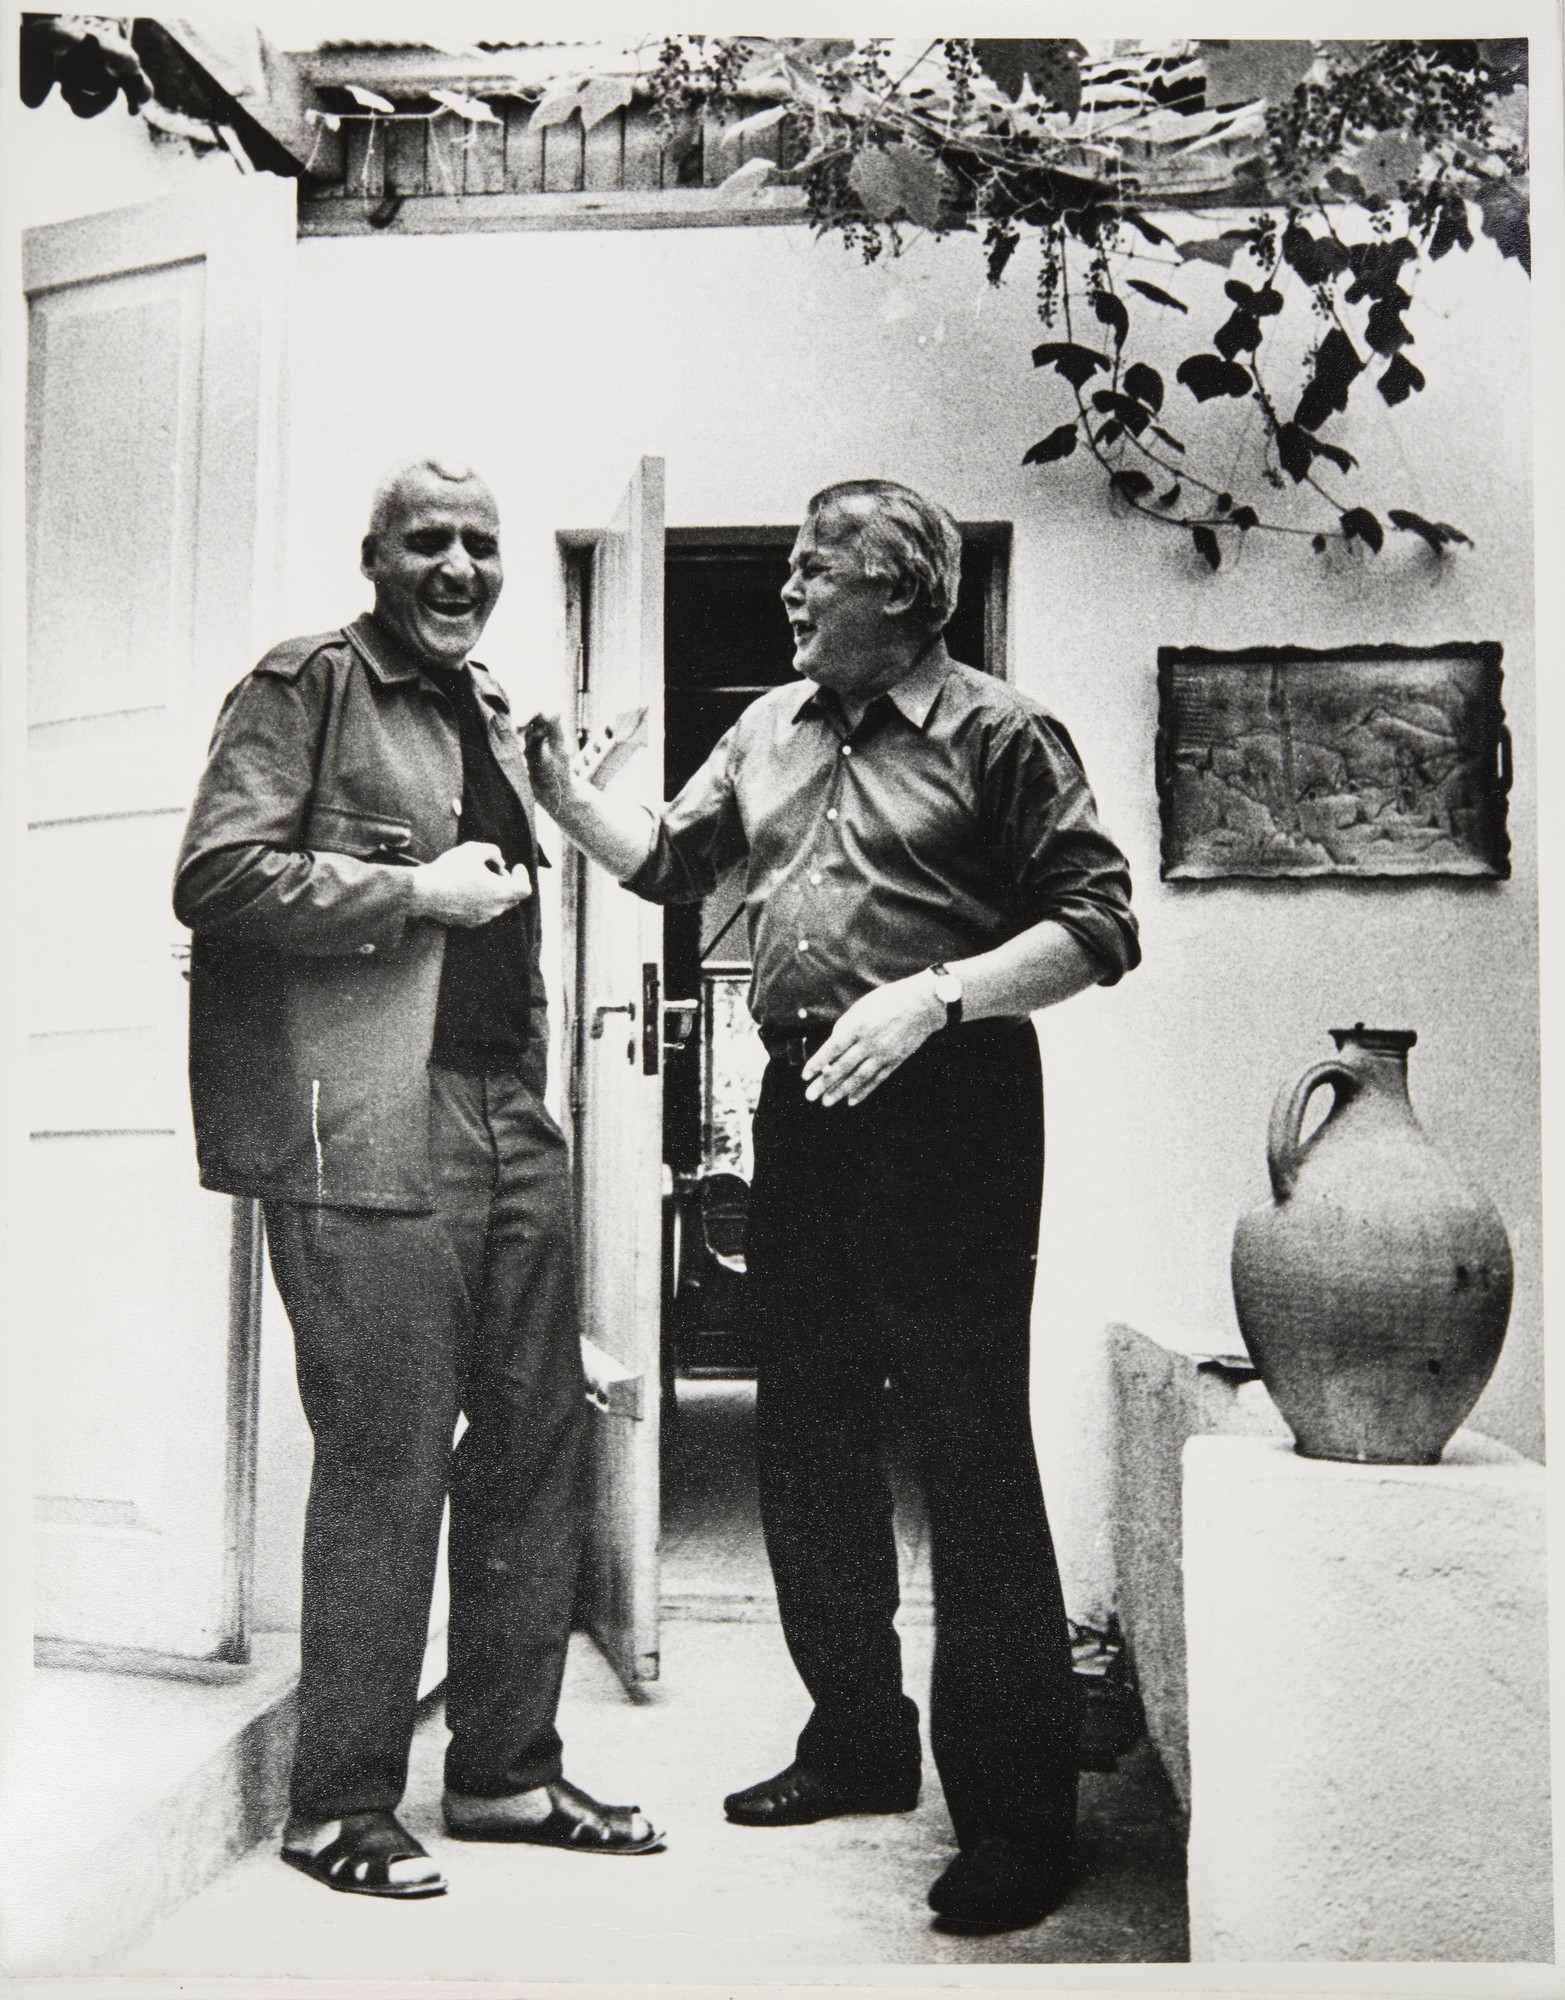 1970-е. К. Симонов и А. Твардовский